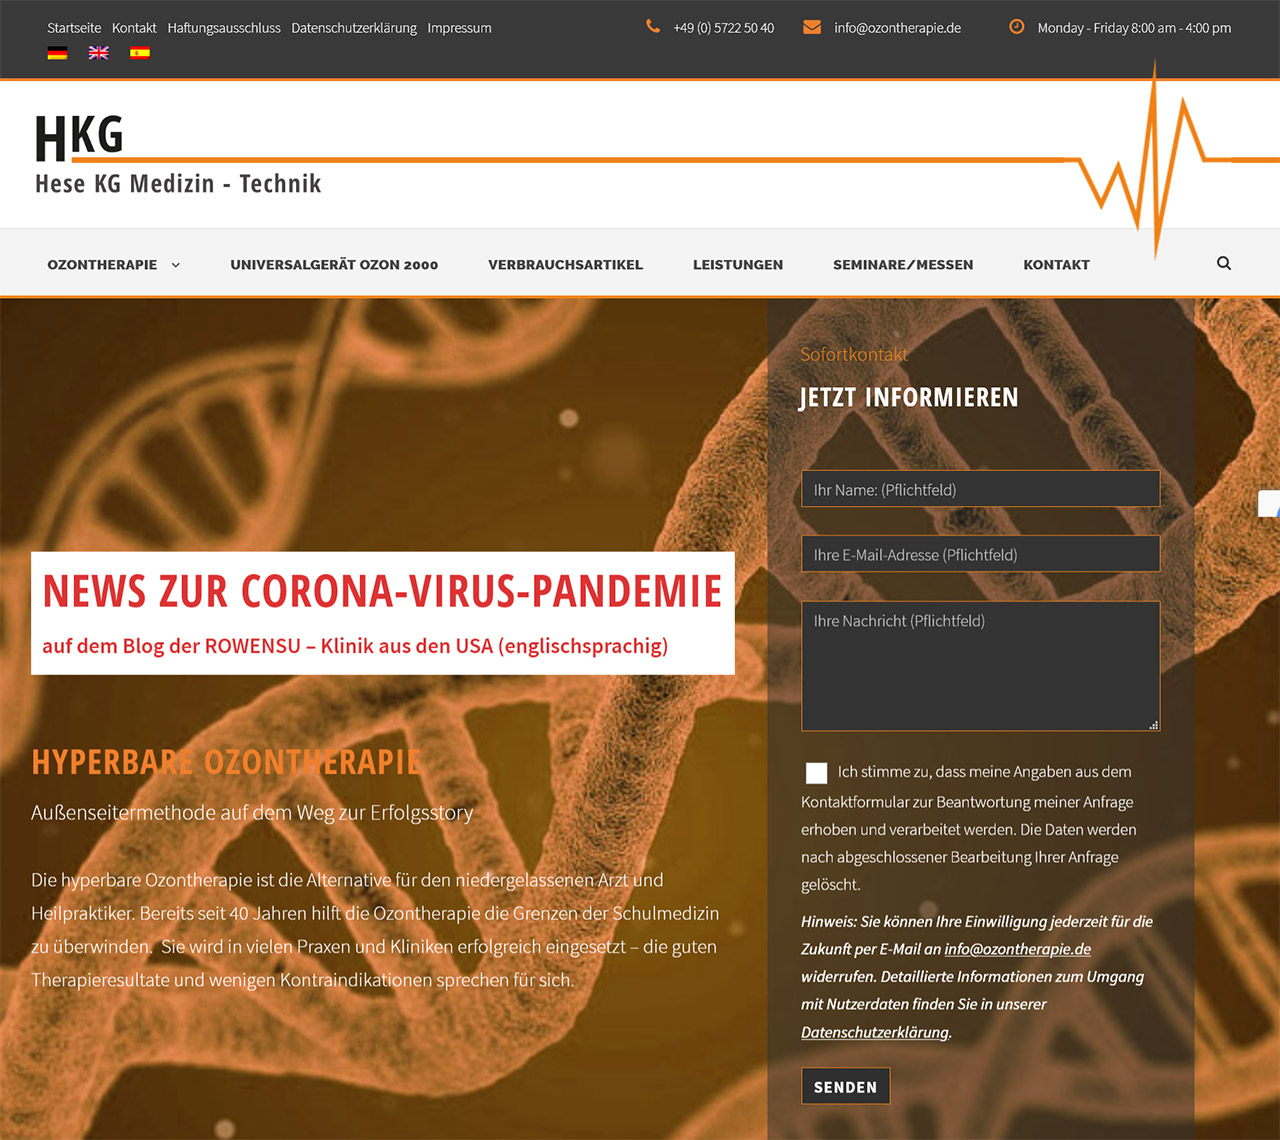 Ozontherapie - Hese KG Medizin-Technik